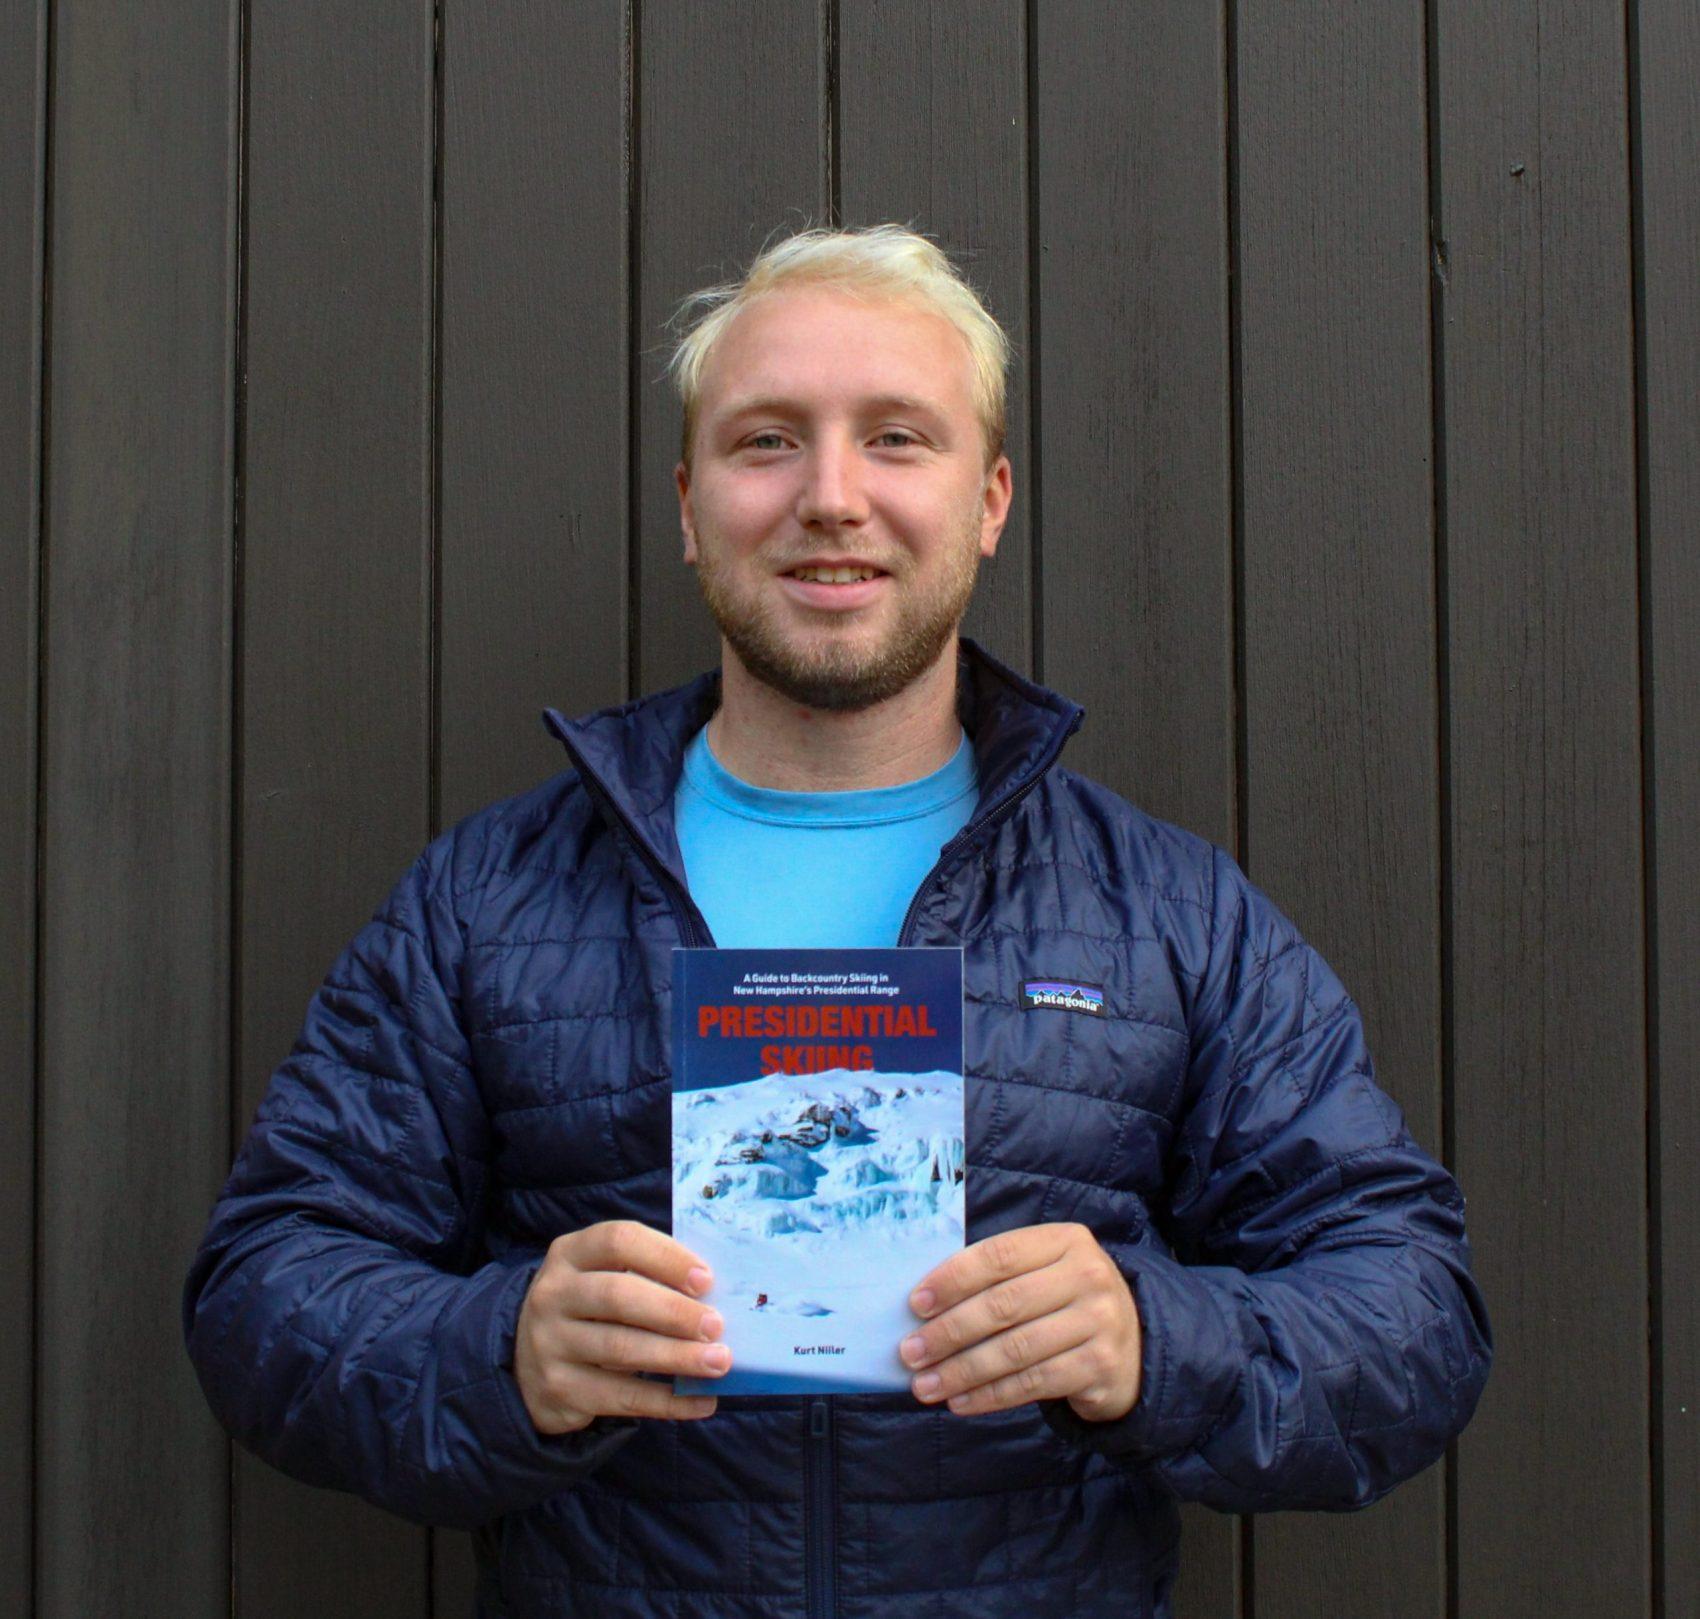 Presidential Skiing author